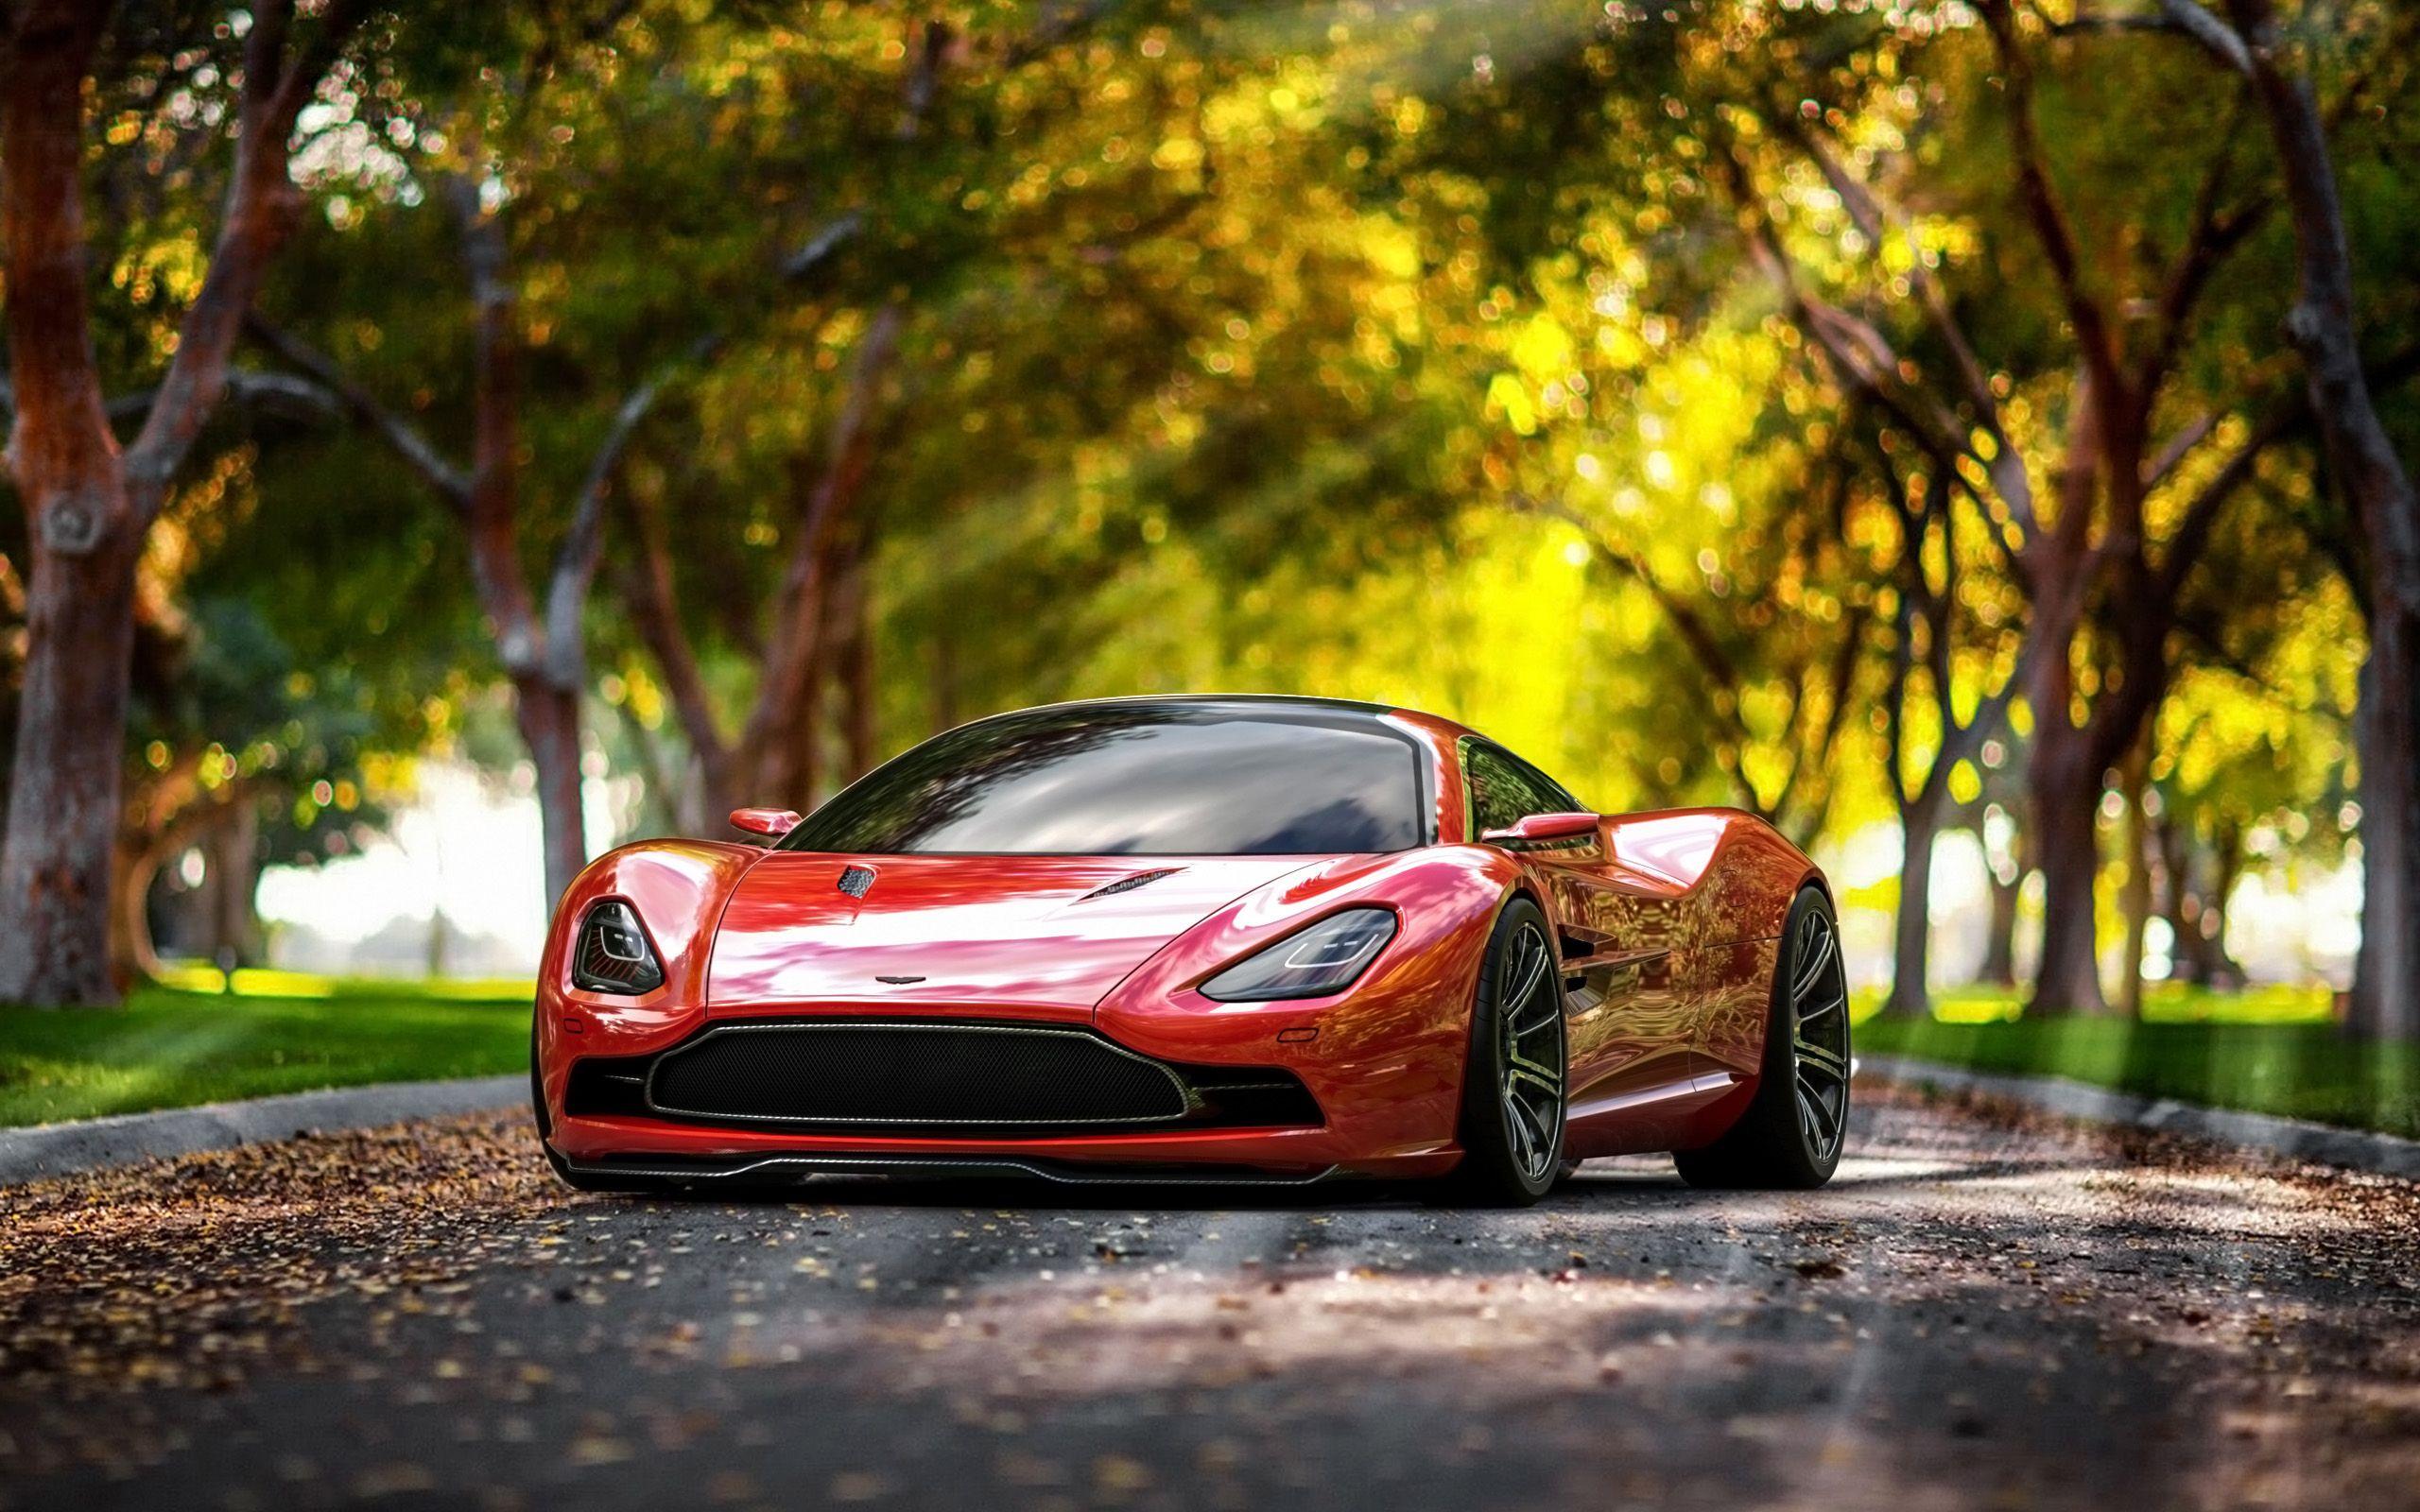 Aston Martin DBC Concept Design By Samir Sadikhov Scenic - Cool cars under 8k